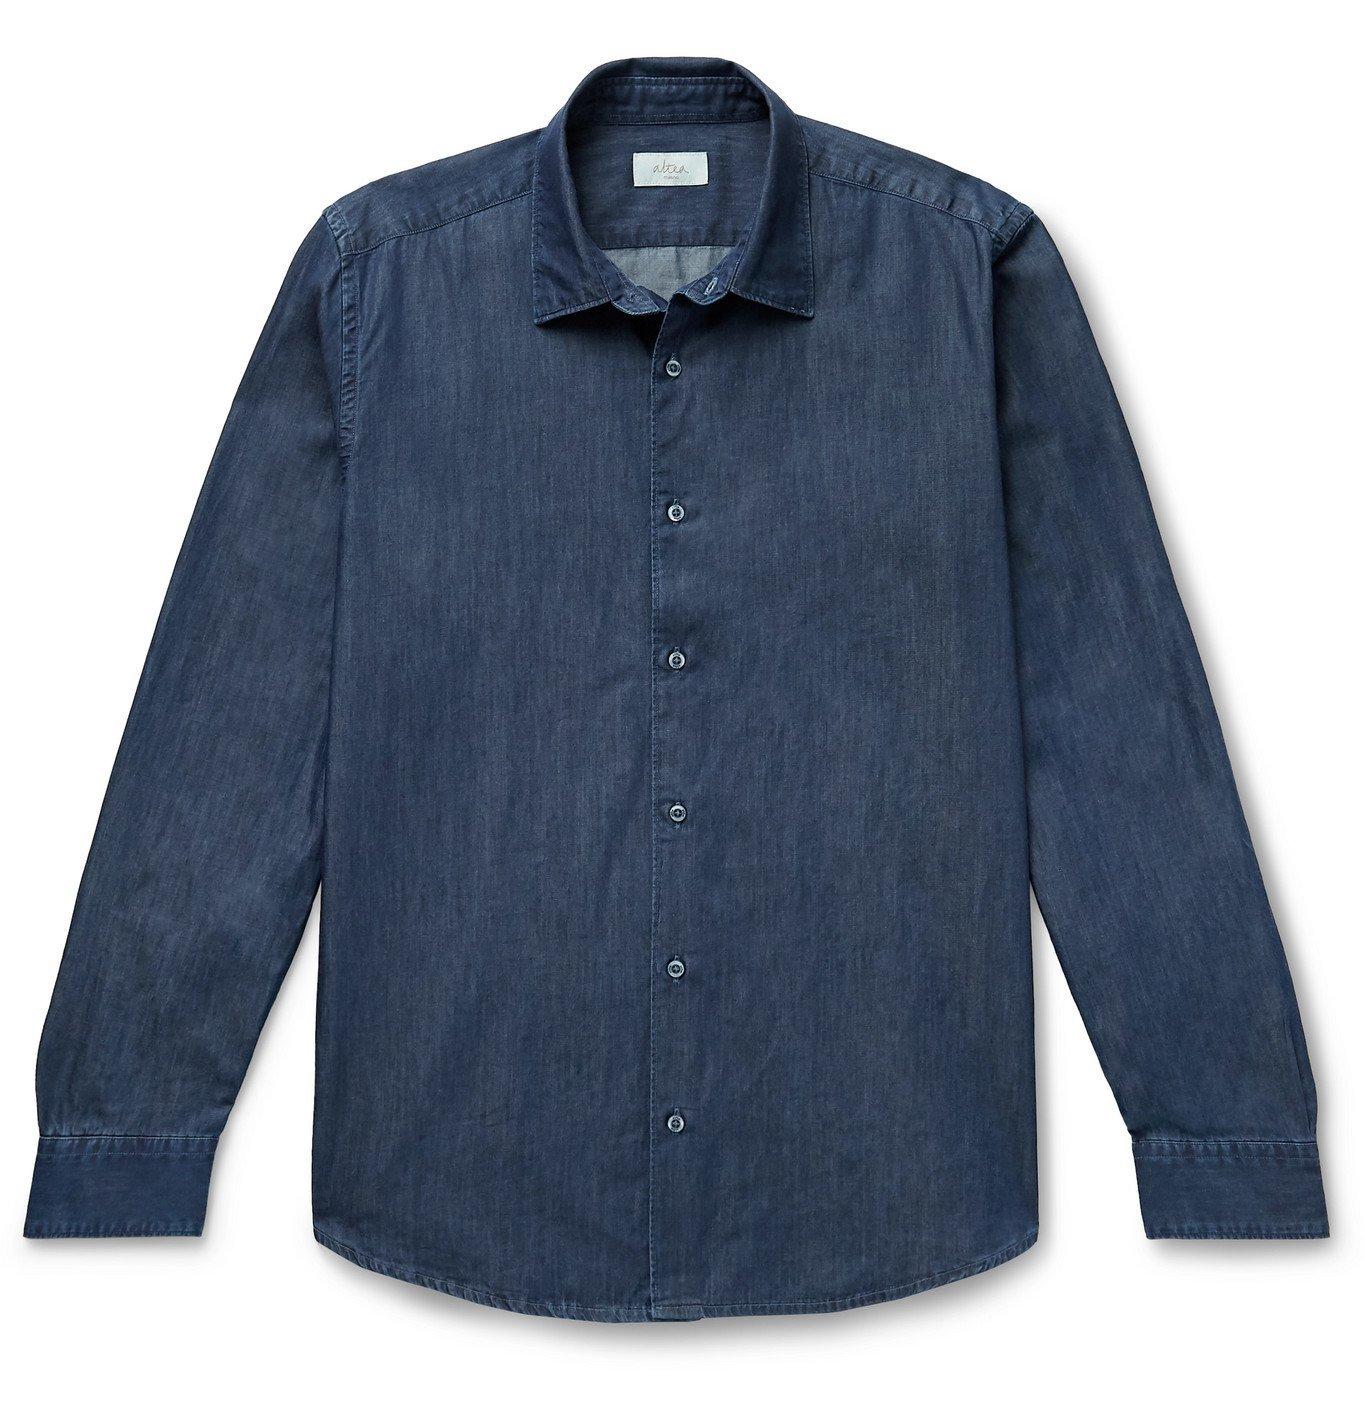 Altea - Cotton-Chambray Shirt - Blue